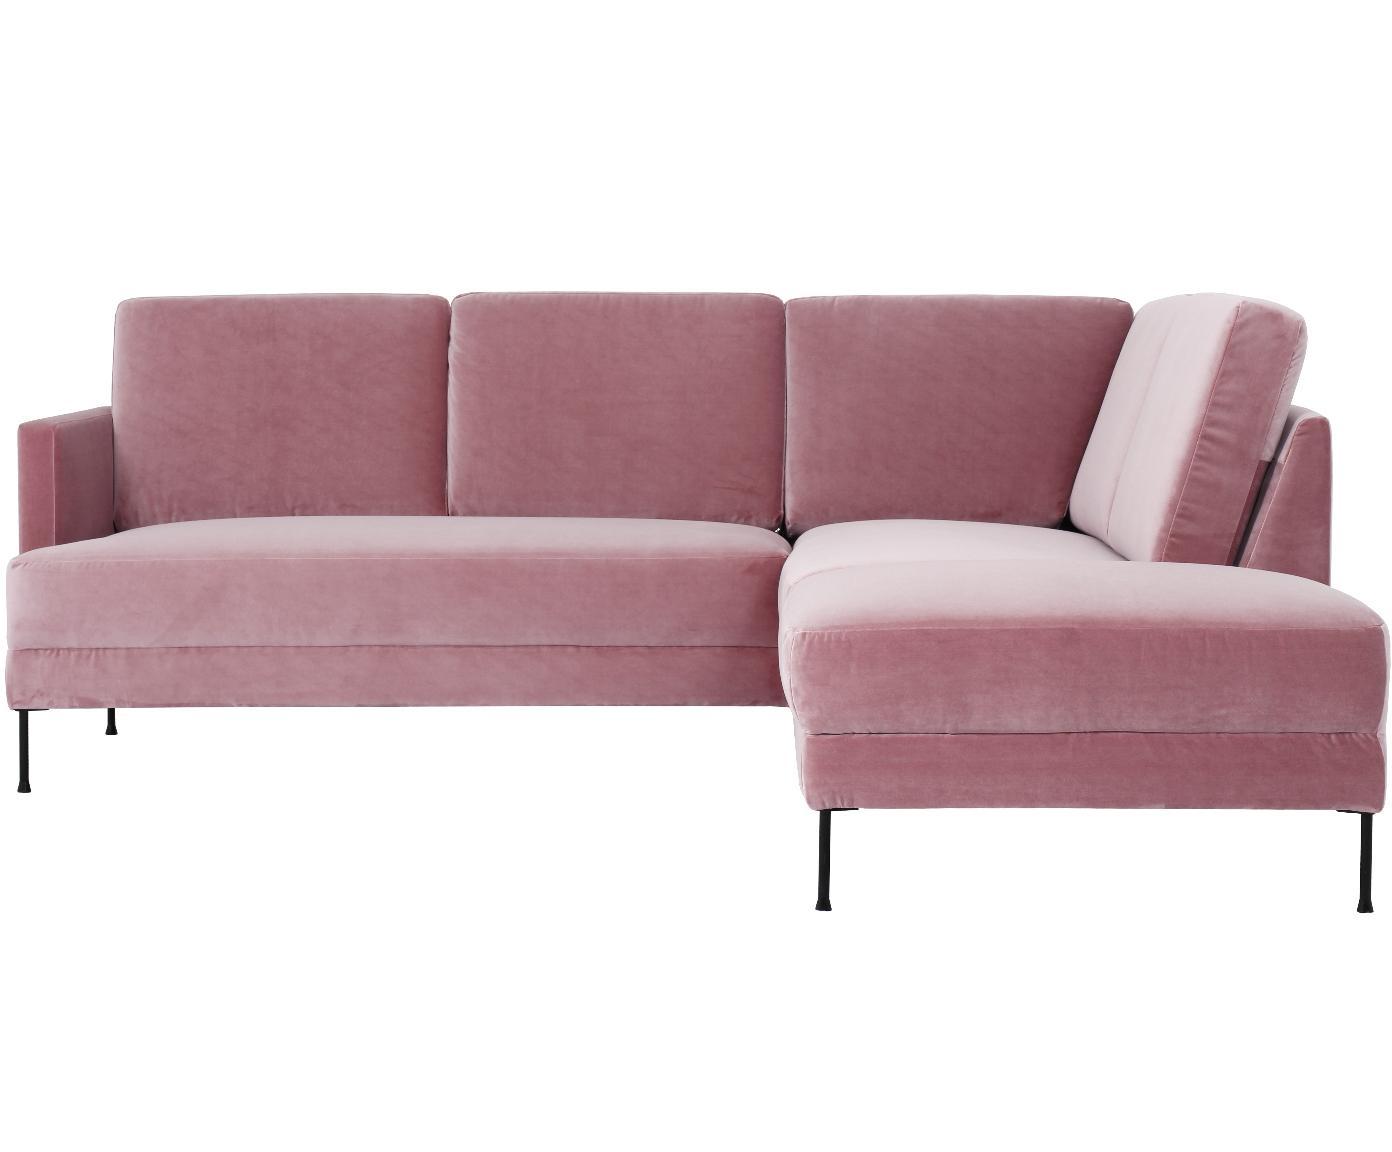 Samt-Ecksofa Fluente, Bezug: Samt (Hochwertiger Polyes, Gestell: Massives Kiefernholz, Samt Rosa, B 221 x T 200 cm